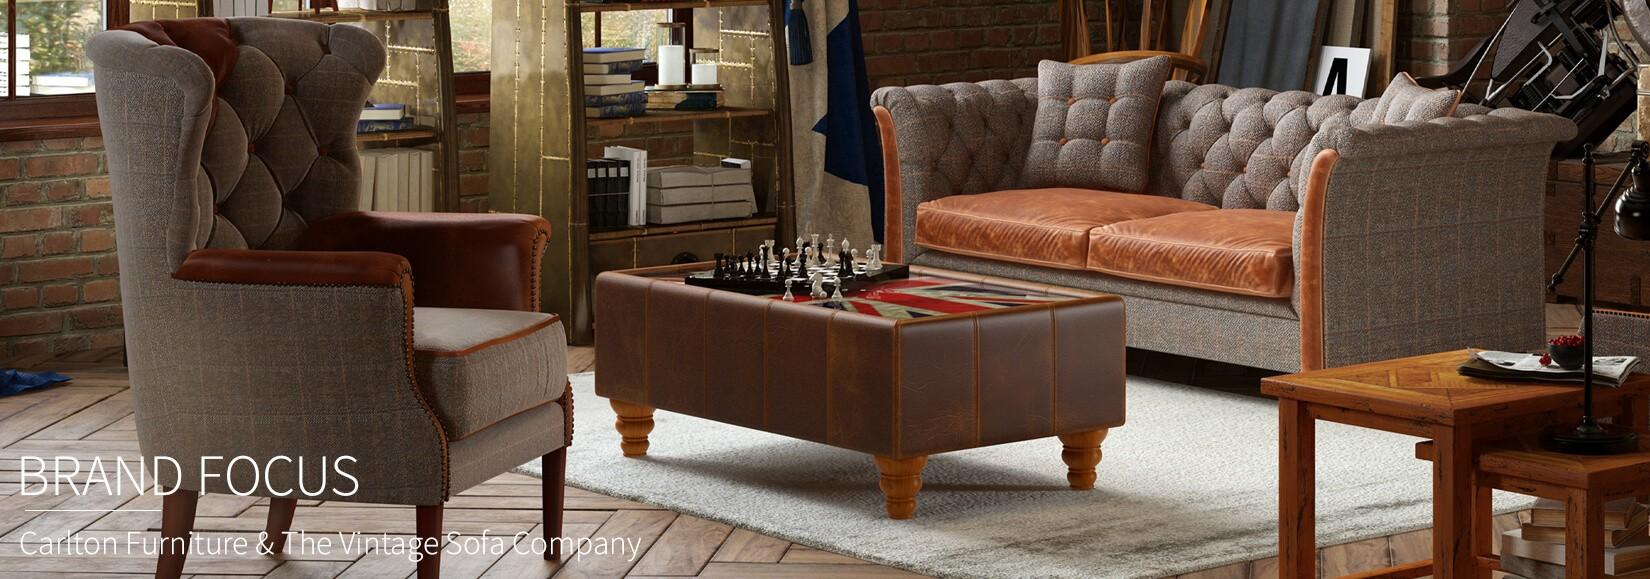 Carlton Furniture & The Vintage Sofa Company: Brand Focus